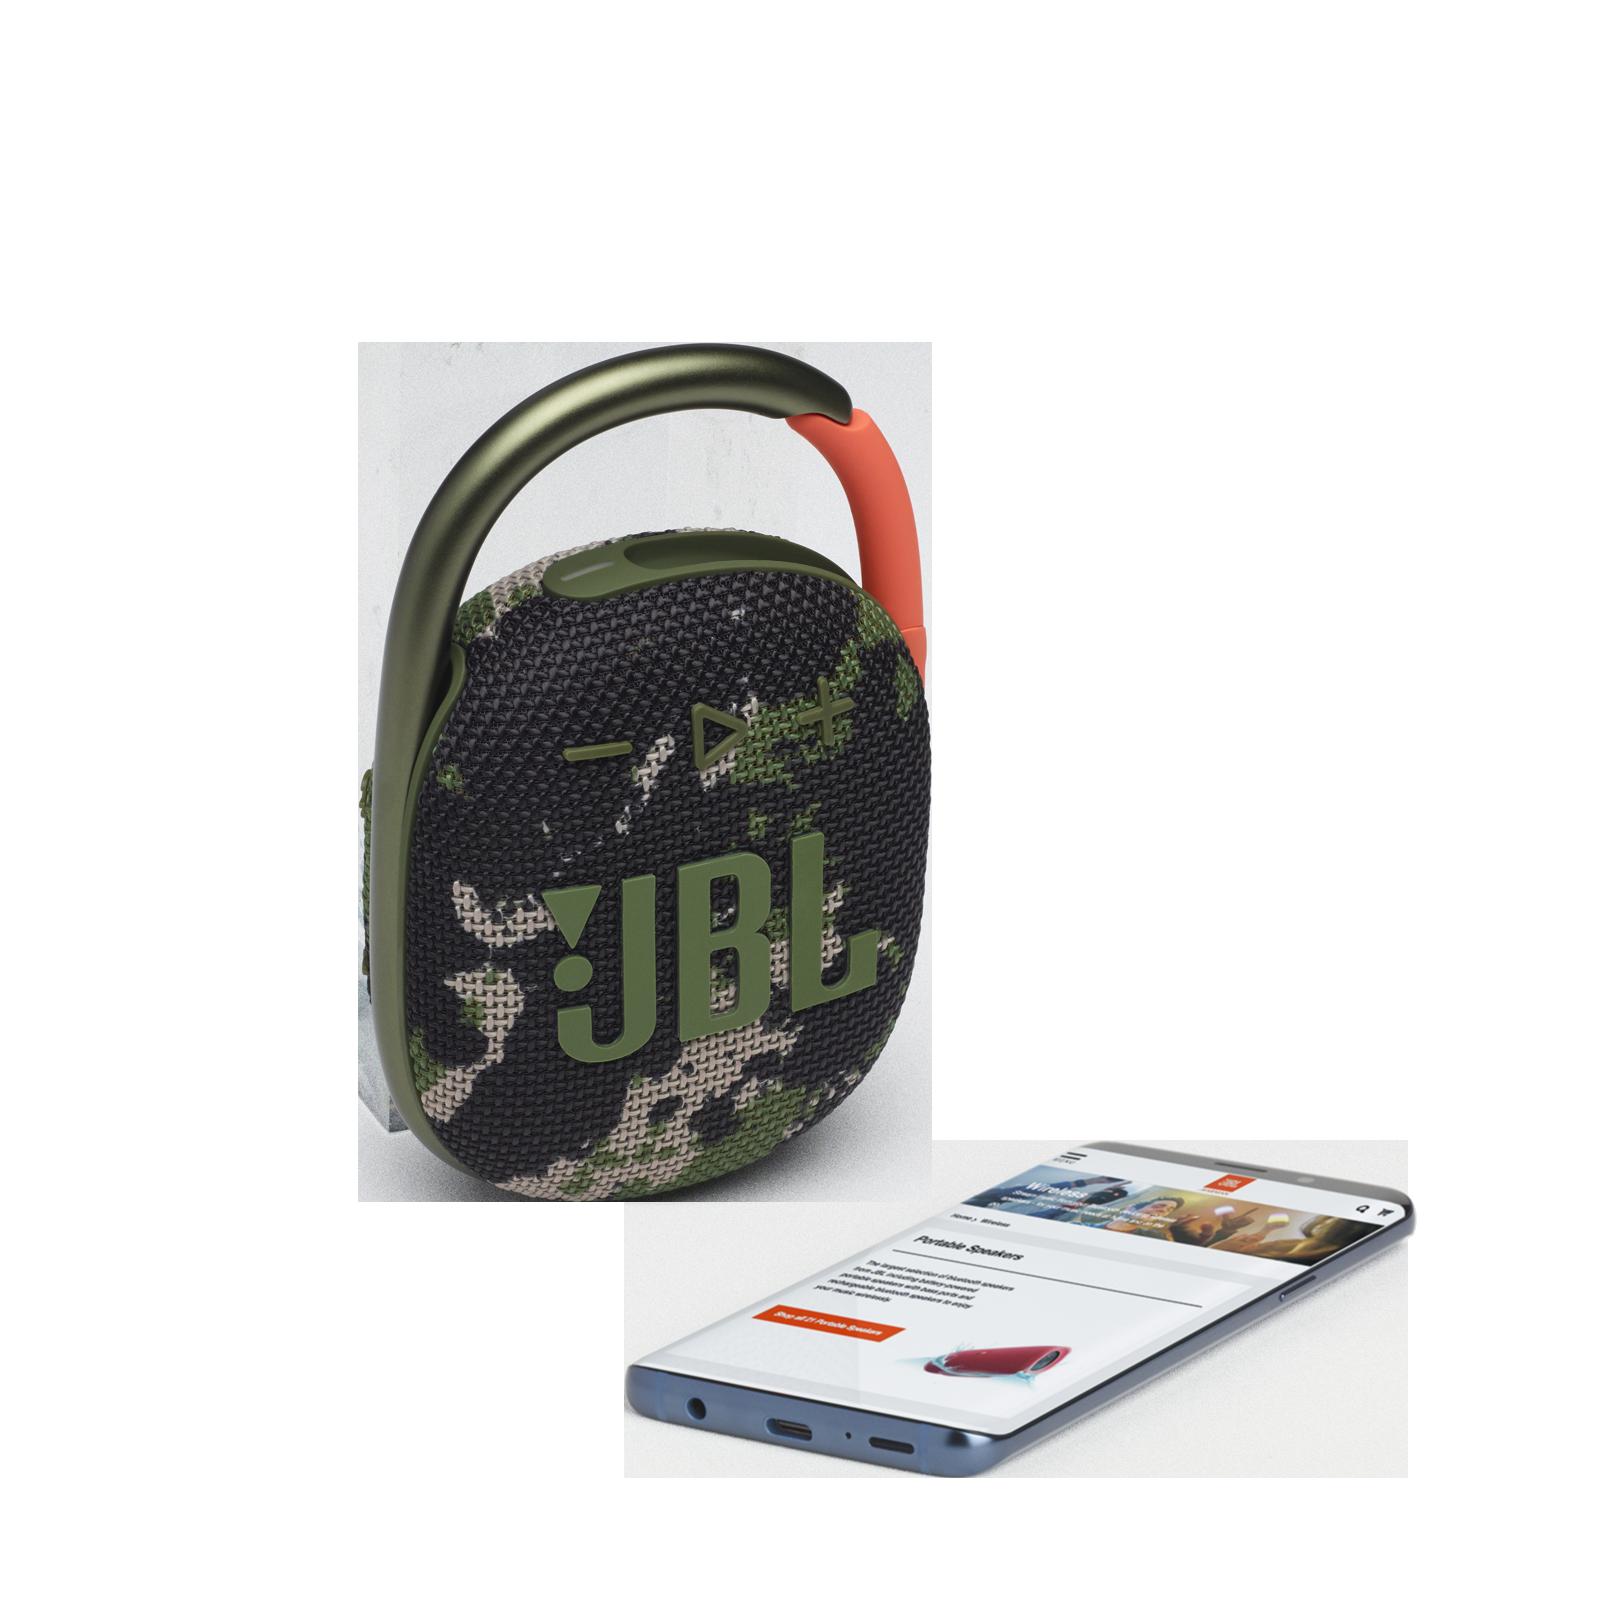 JBL CLIP 4 - Squad - Ultra-portable Waterproof Speaker - Detailshot 1